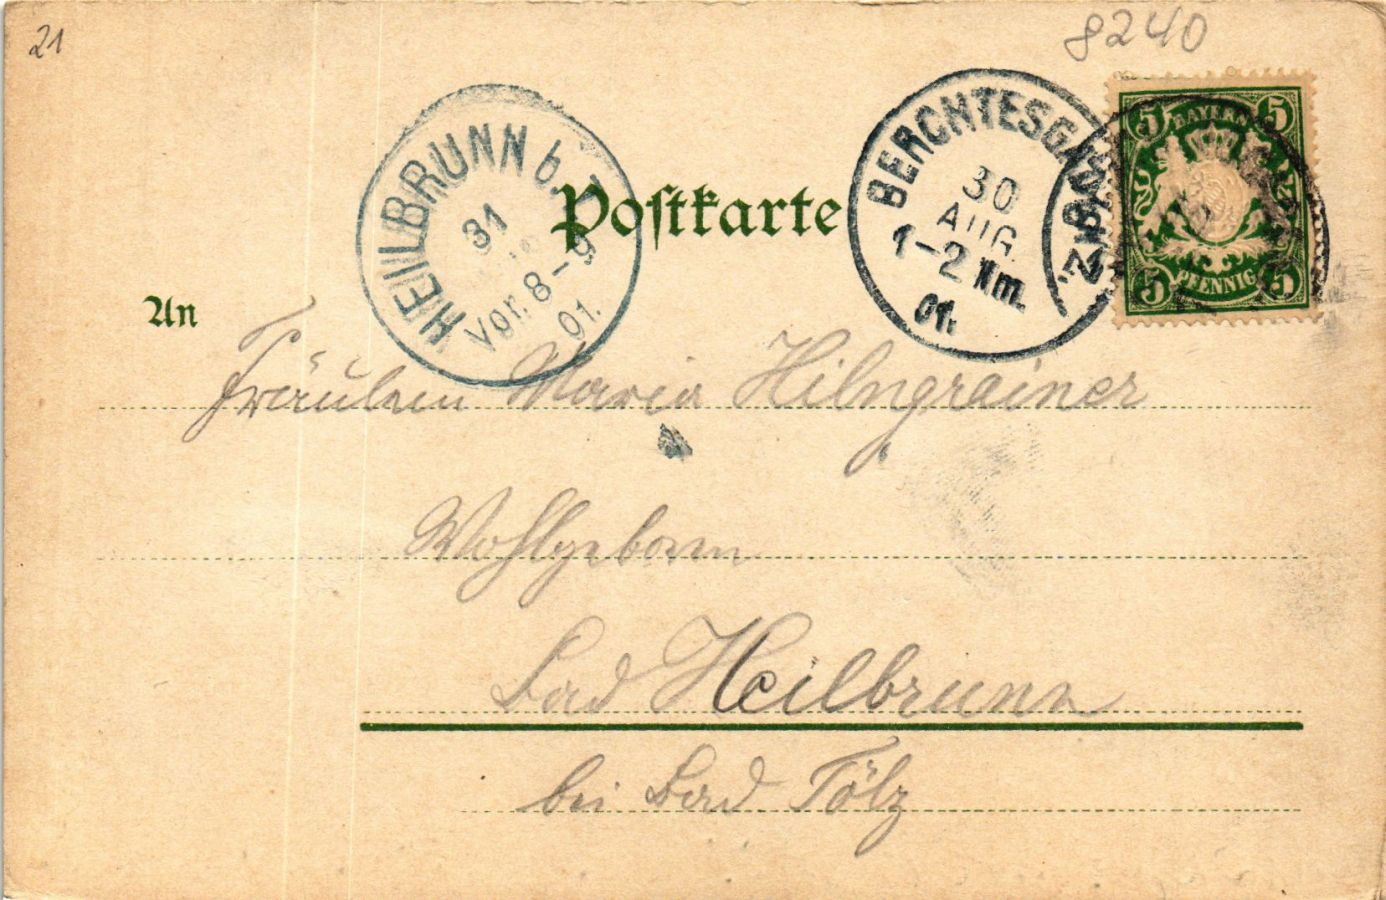 CPA-AK-Konigssee-St-Bartholoma-GERMANY-878944 miniature 2